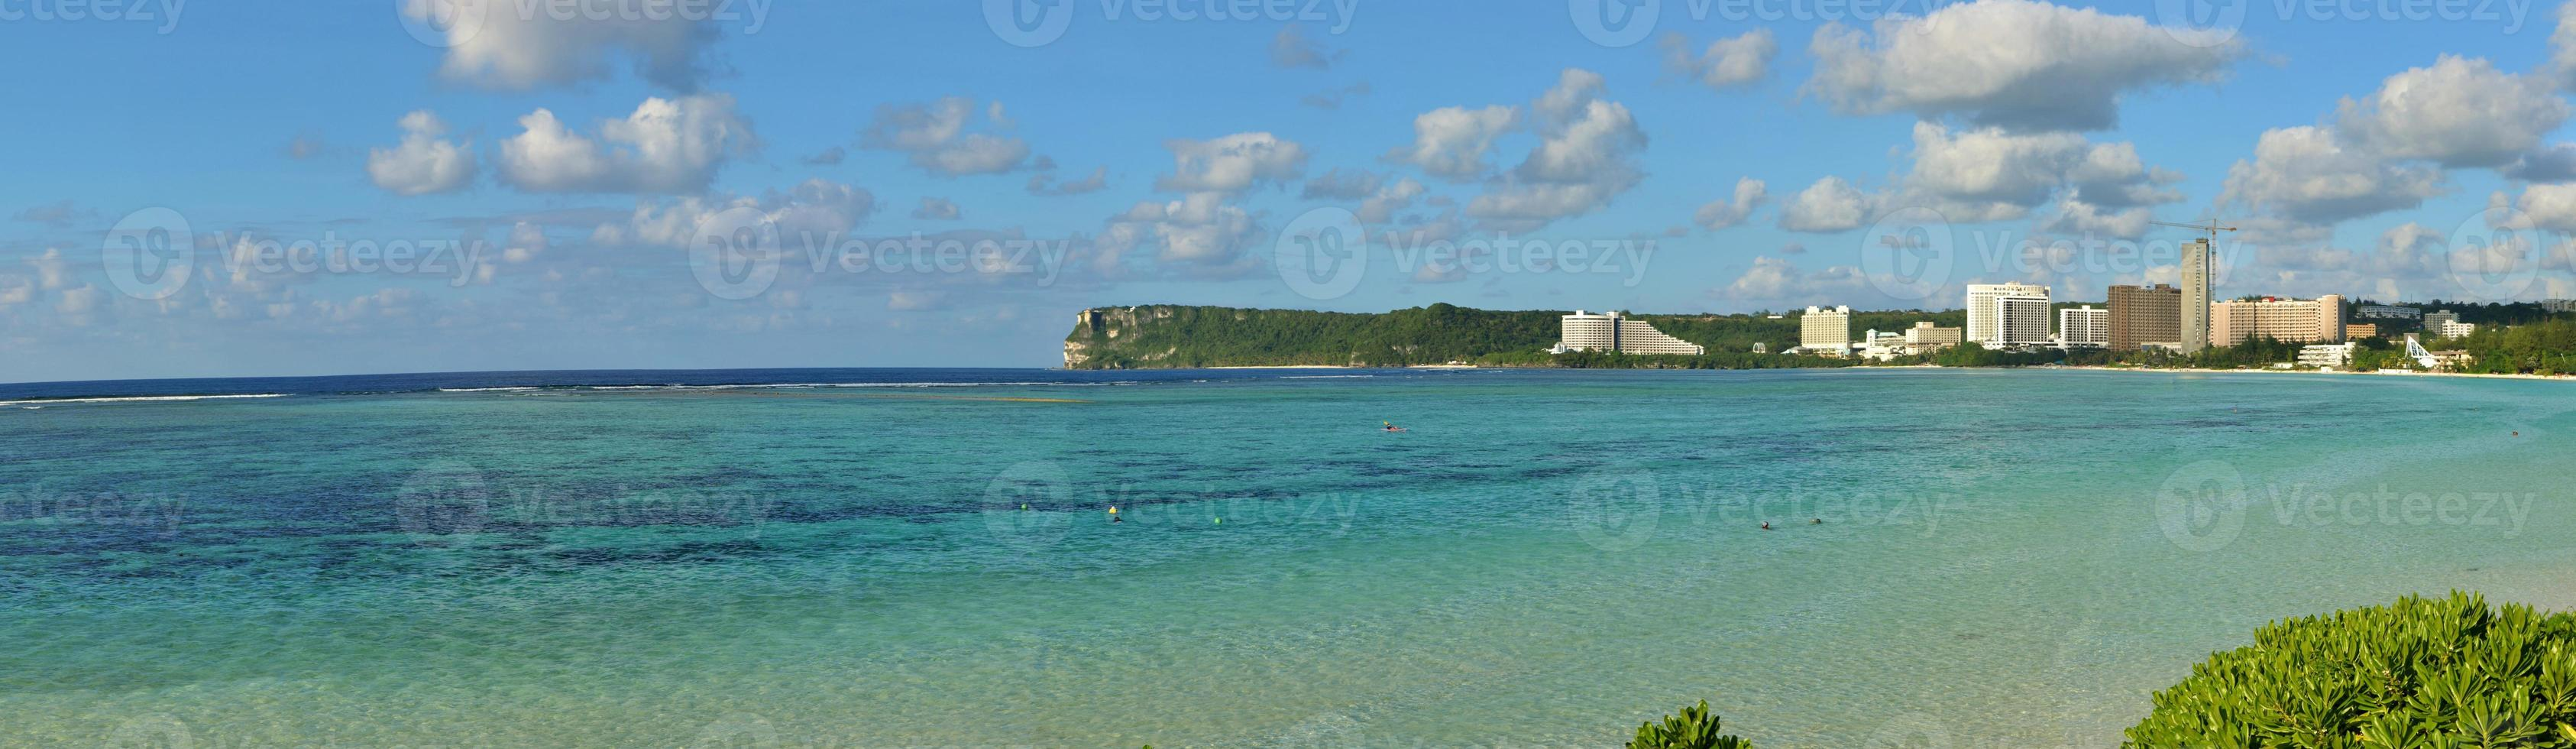 tropisches Inselstrandpanorama foto